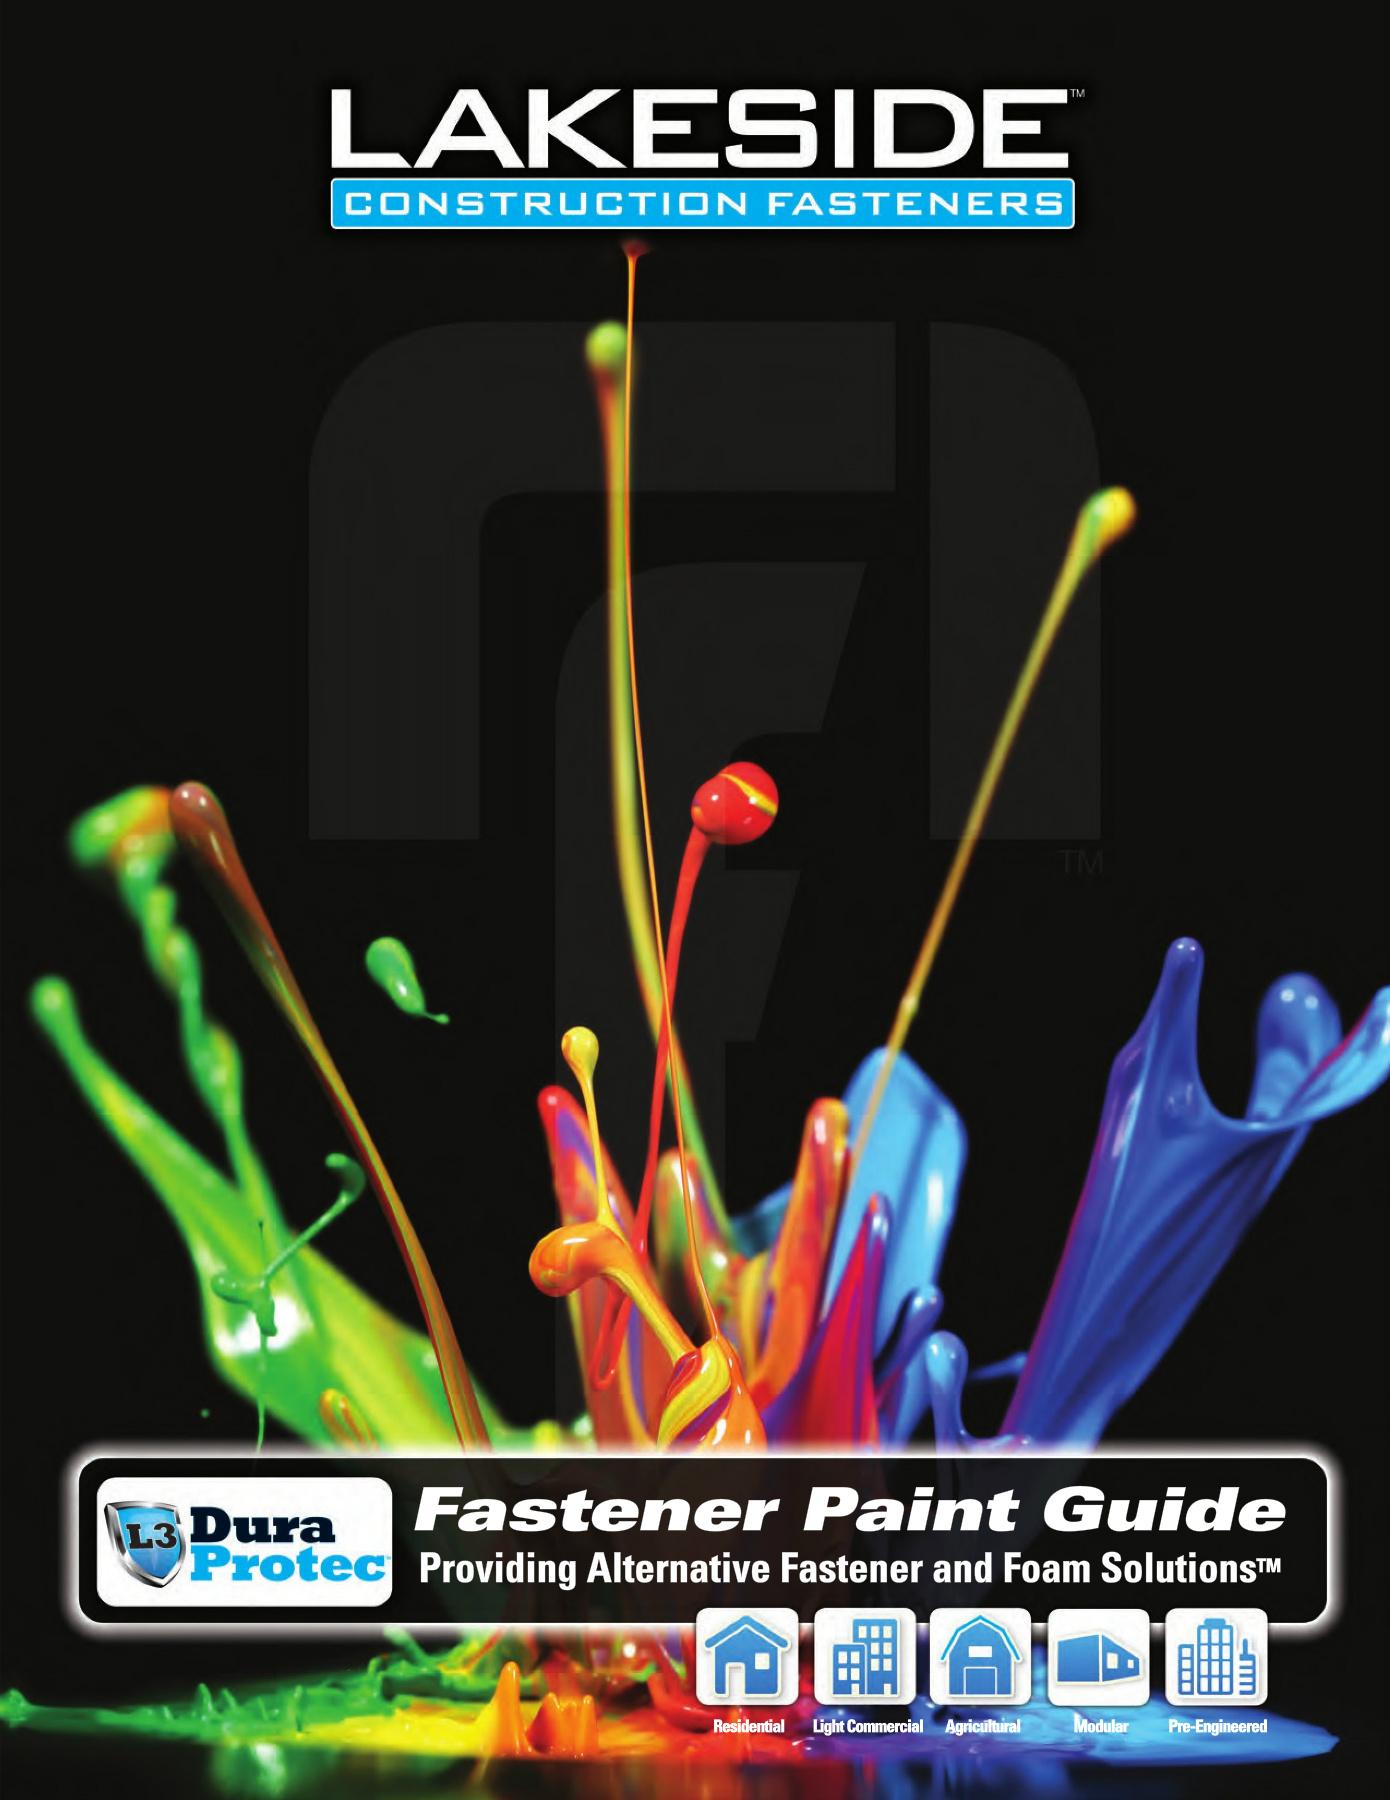 Lakeside Construction Fasteners 2018 Catalog